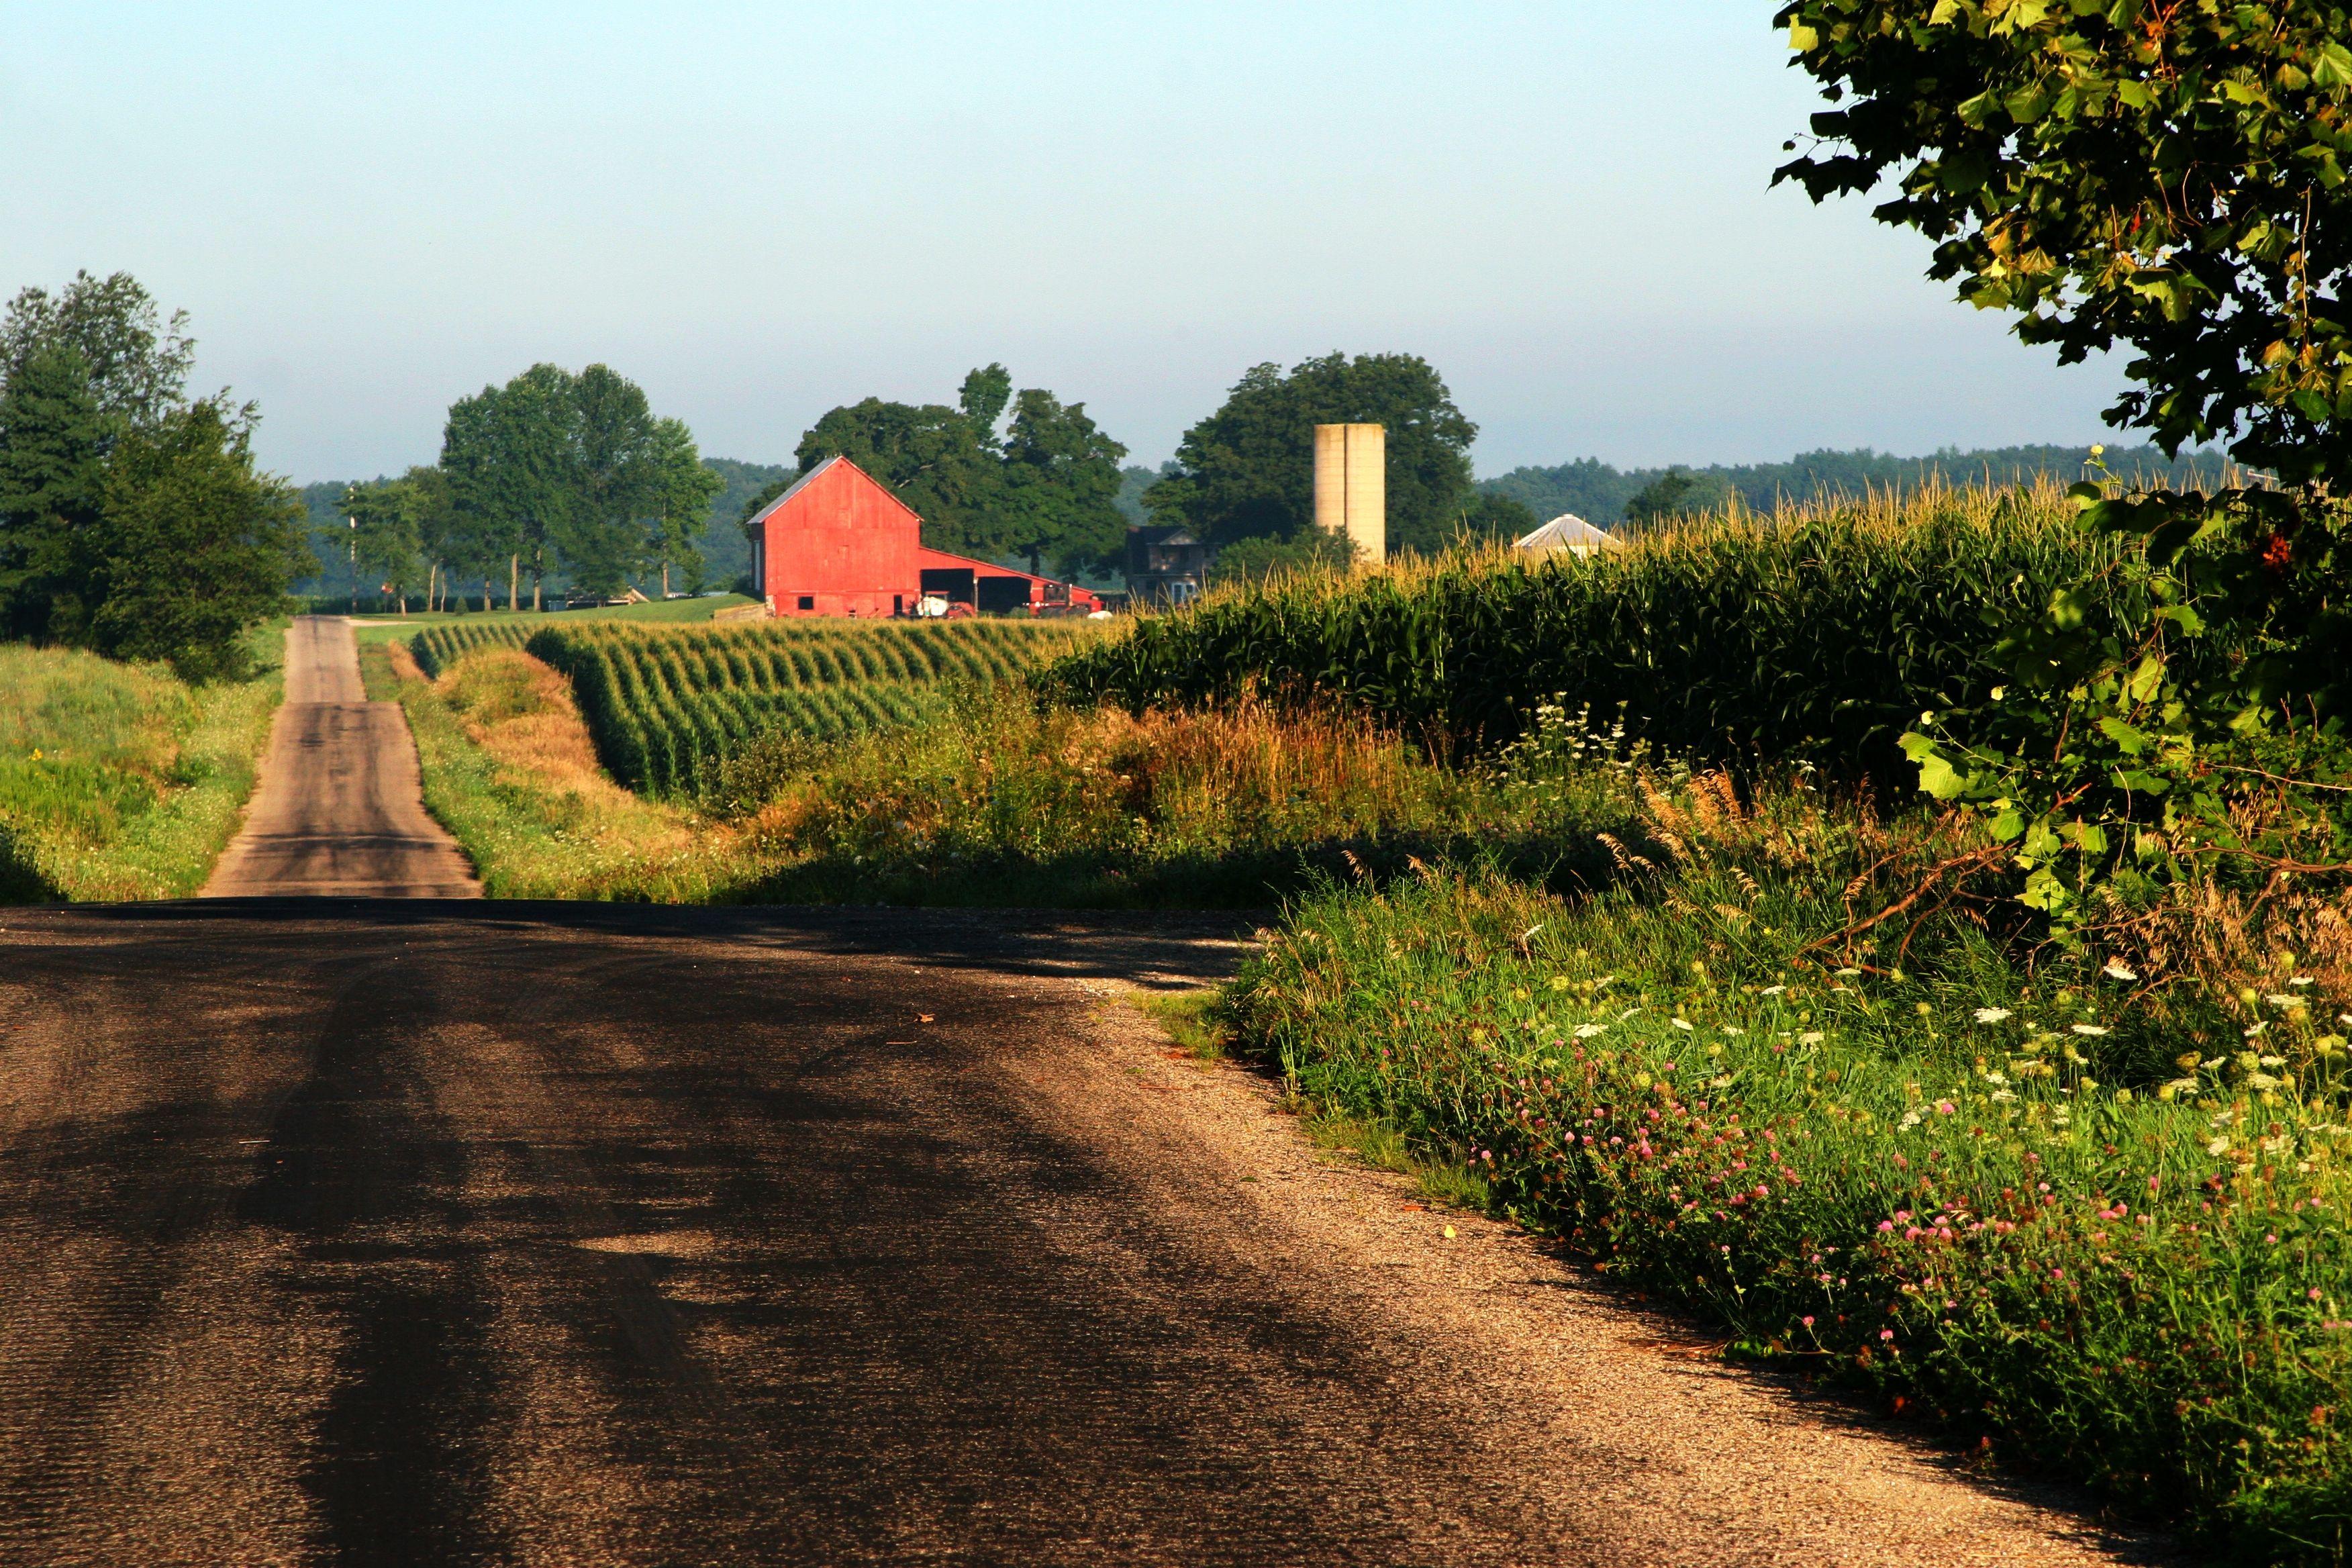 dirtpatch farm cornfield ordinary